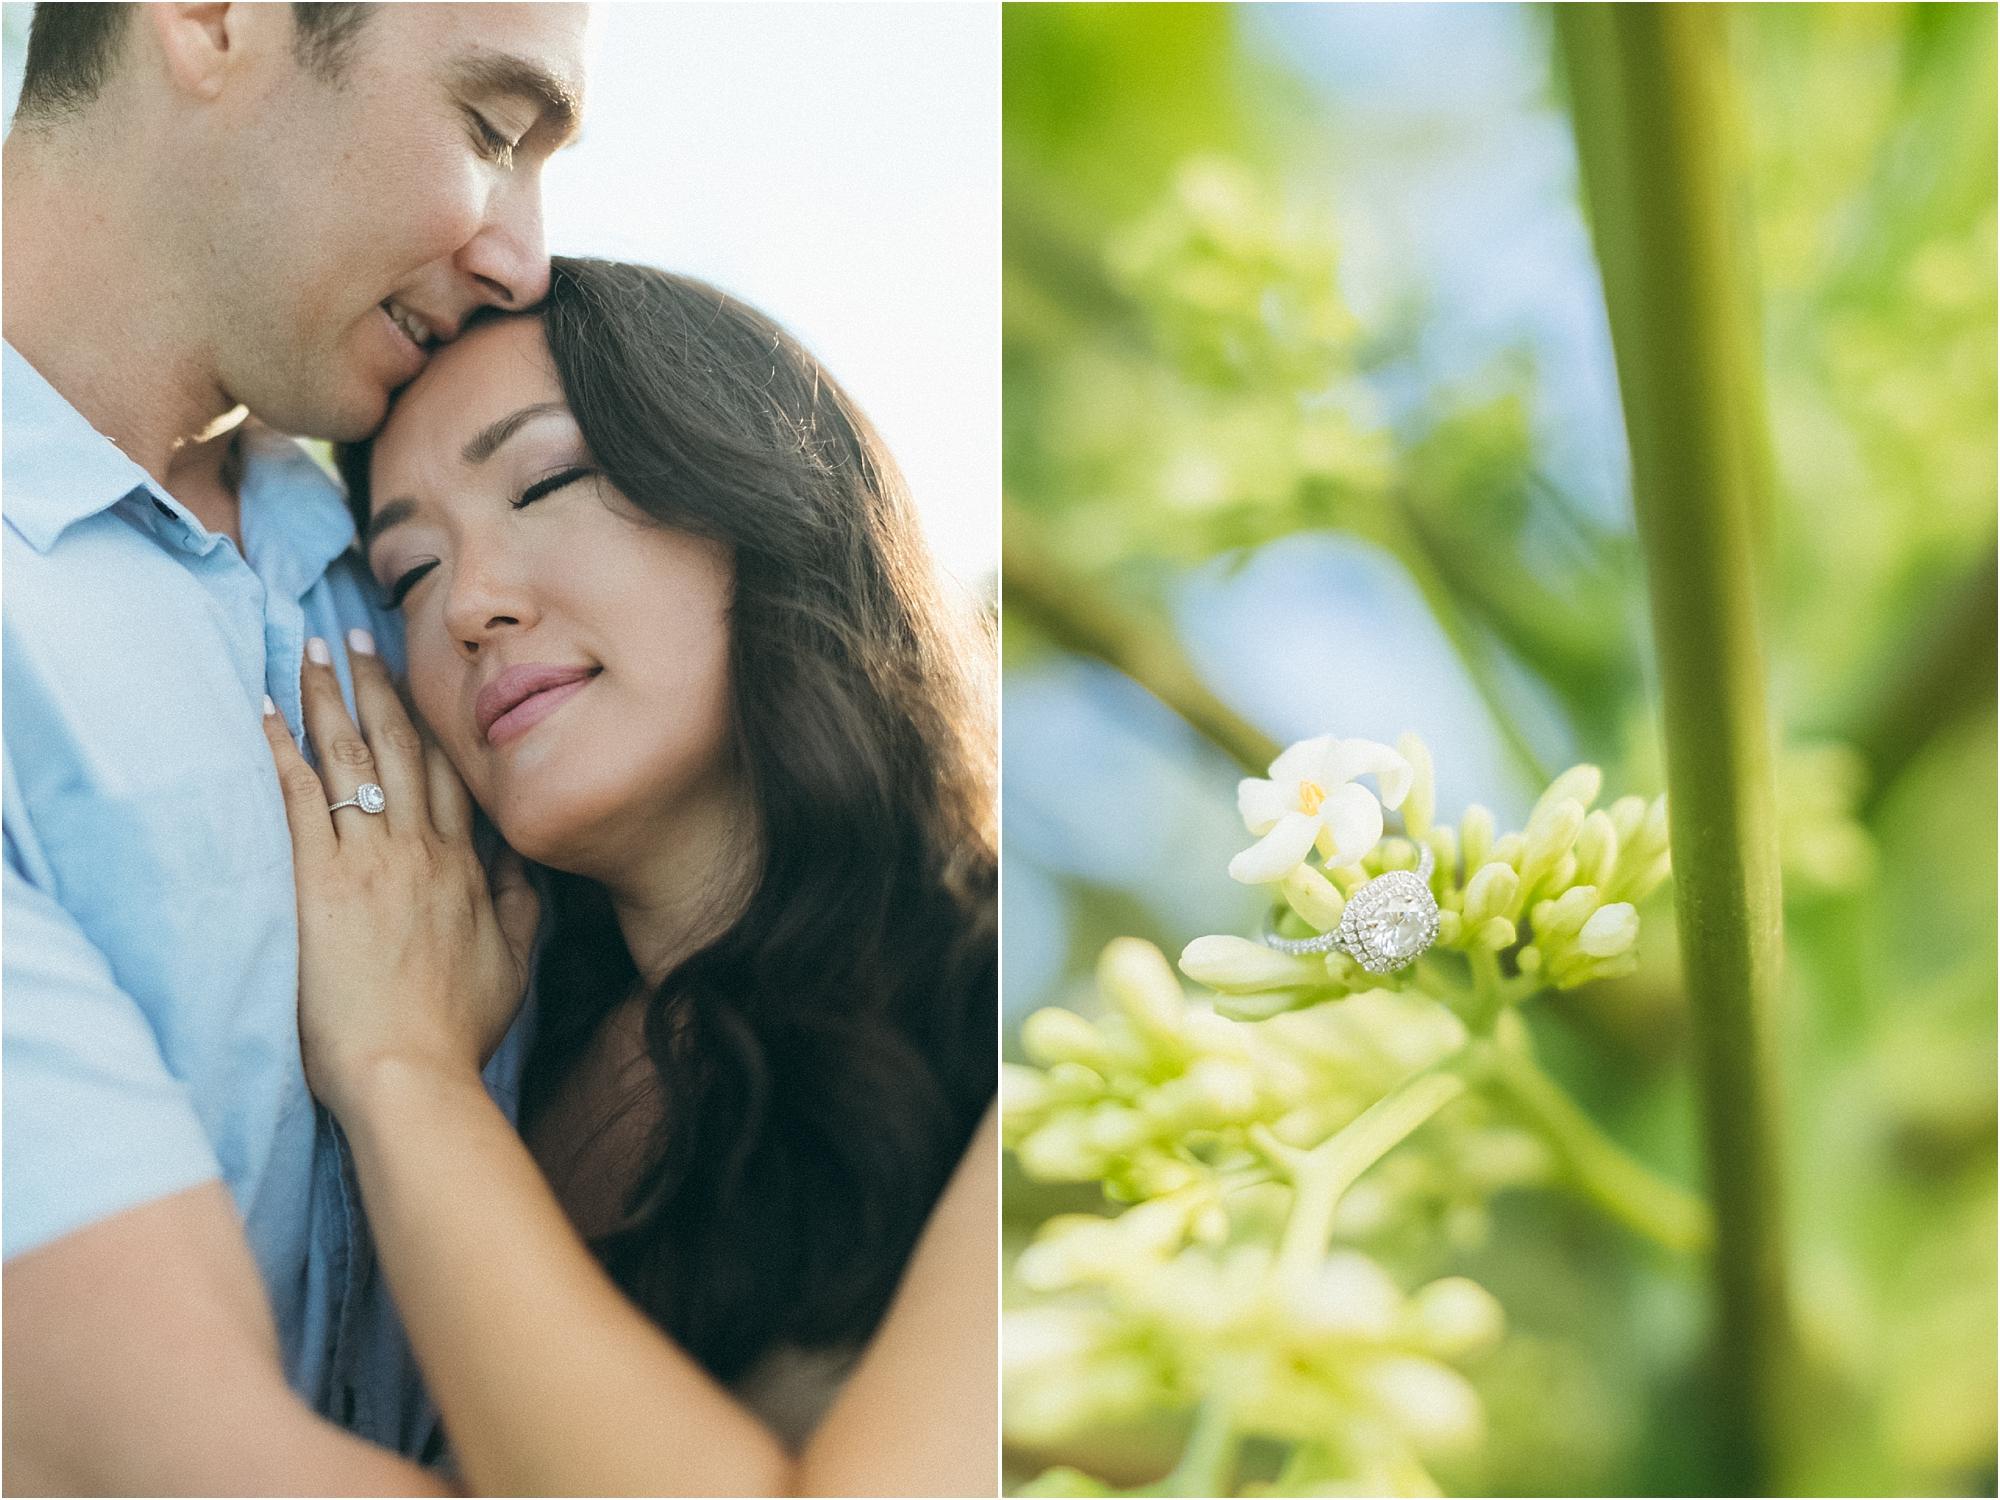 angie-diaz-photography-maui-hawaii-engagement-wedding-photographer_0011.jpg